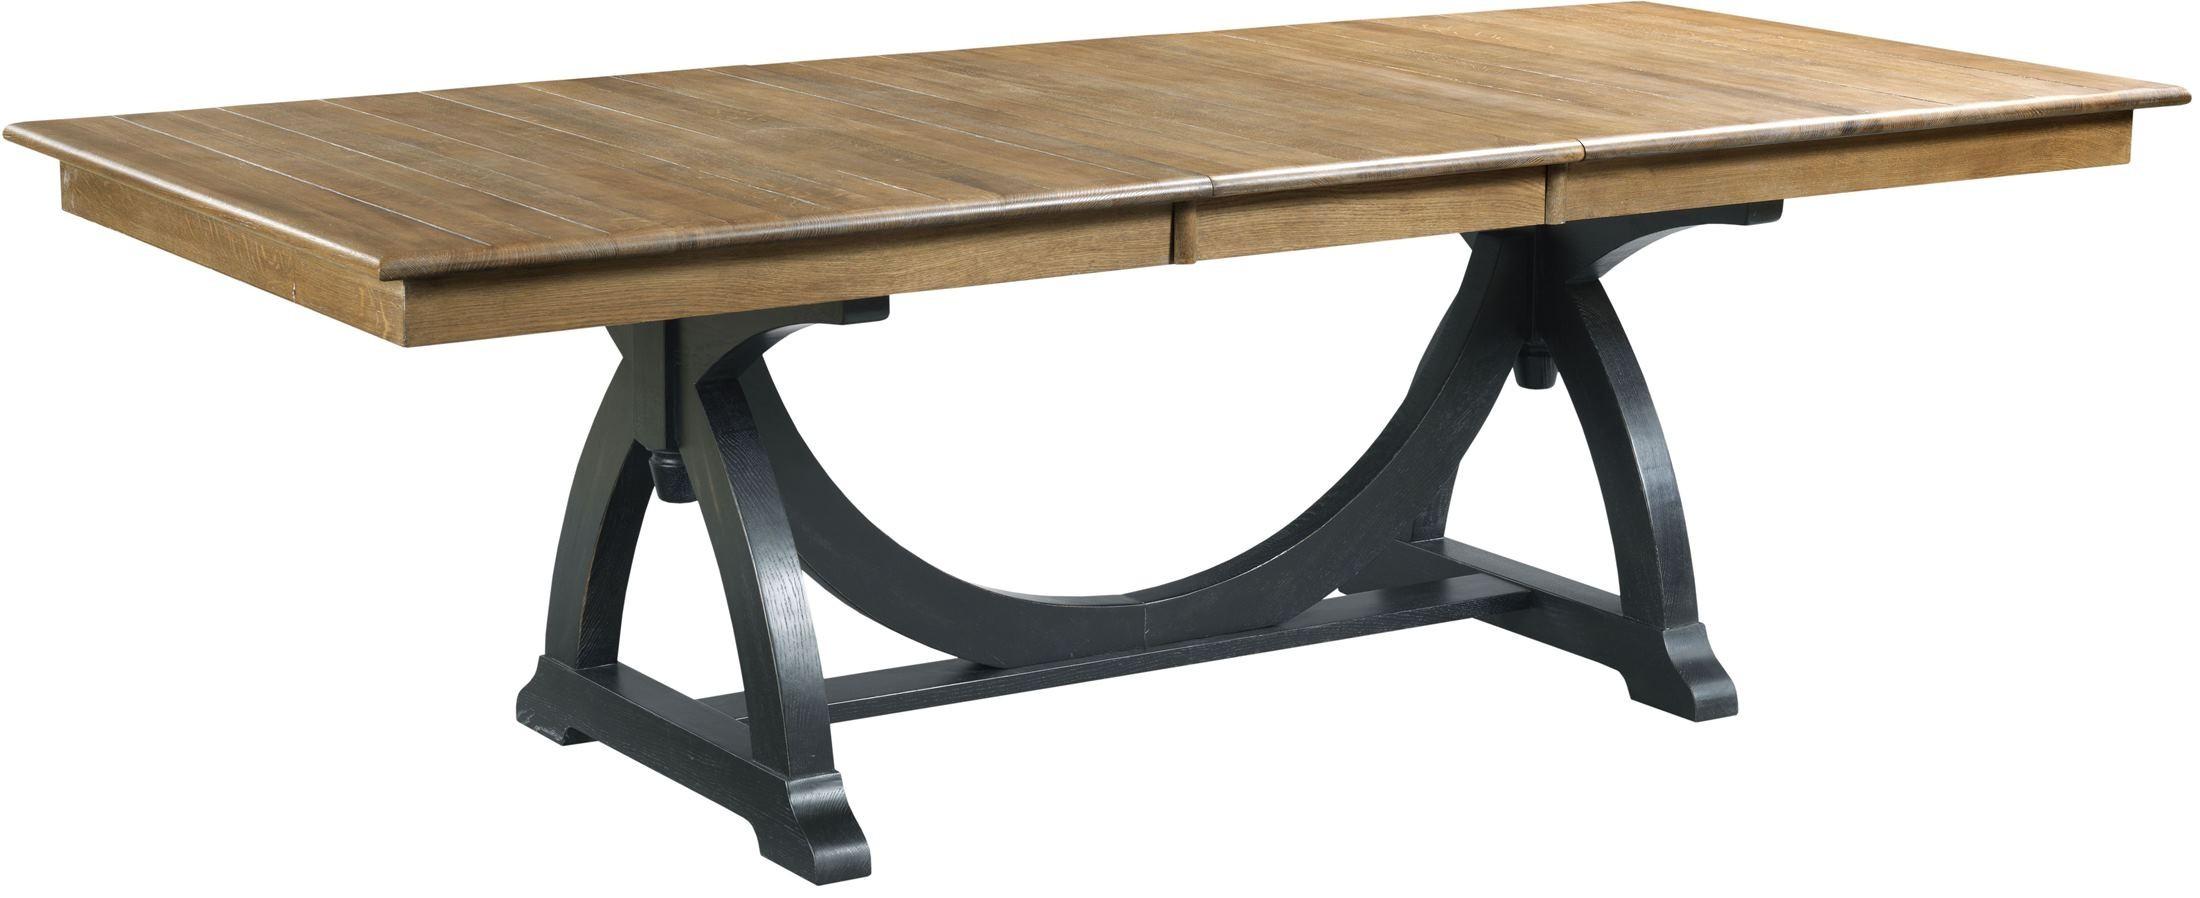 Stone Ridge Extendable Rectangular Trestle Dining Table  : stoneridge72 056leaf from colemanfurniture.com size 2200 x 898 jpeg 177kB